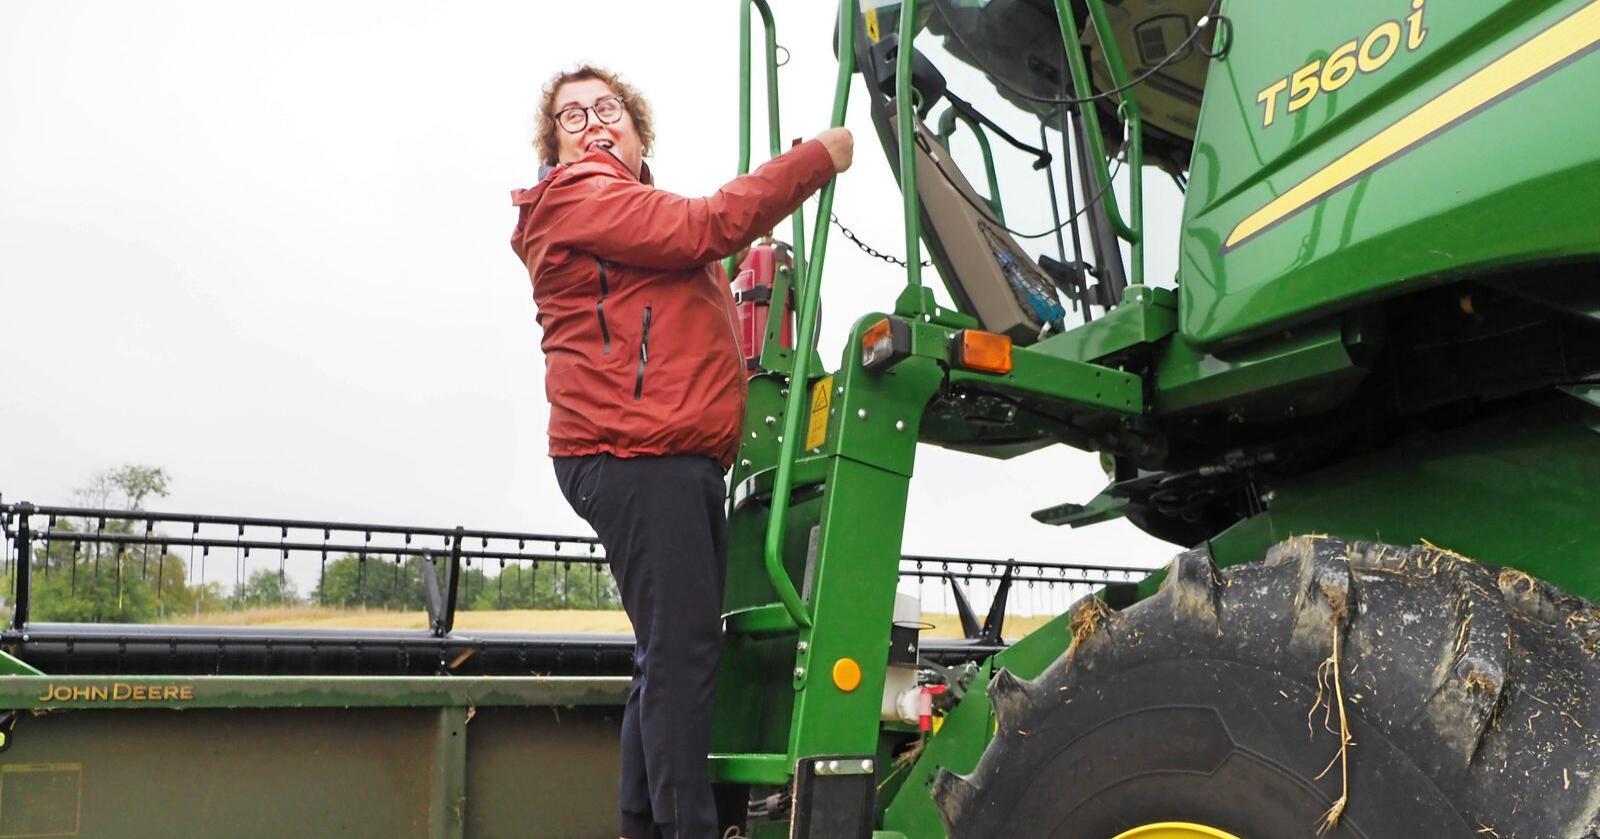 Under åpningen av kontorene til Landbruksdirektoratet i Steinkjer, fortalte Olaug Bollestad at de vil få en økt bevilling i neste års statsbudsjett. Foto: Siri Juell Rasmussen